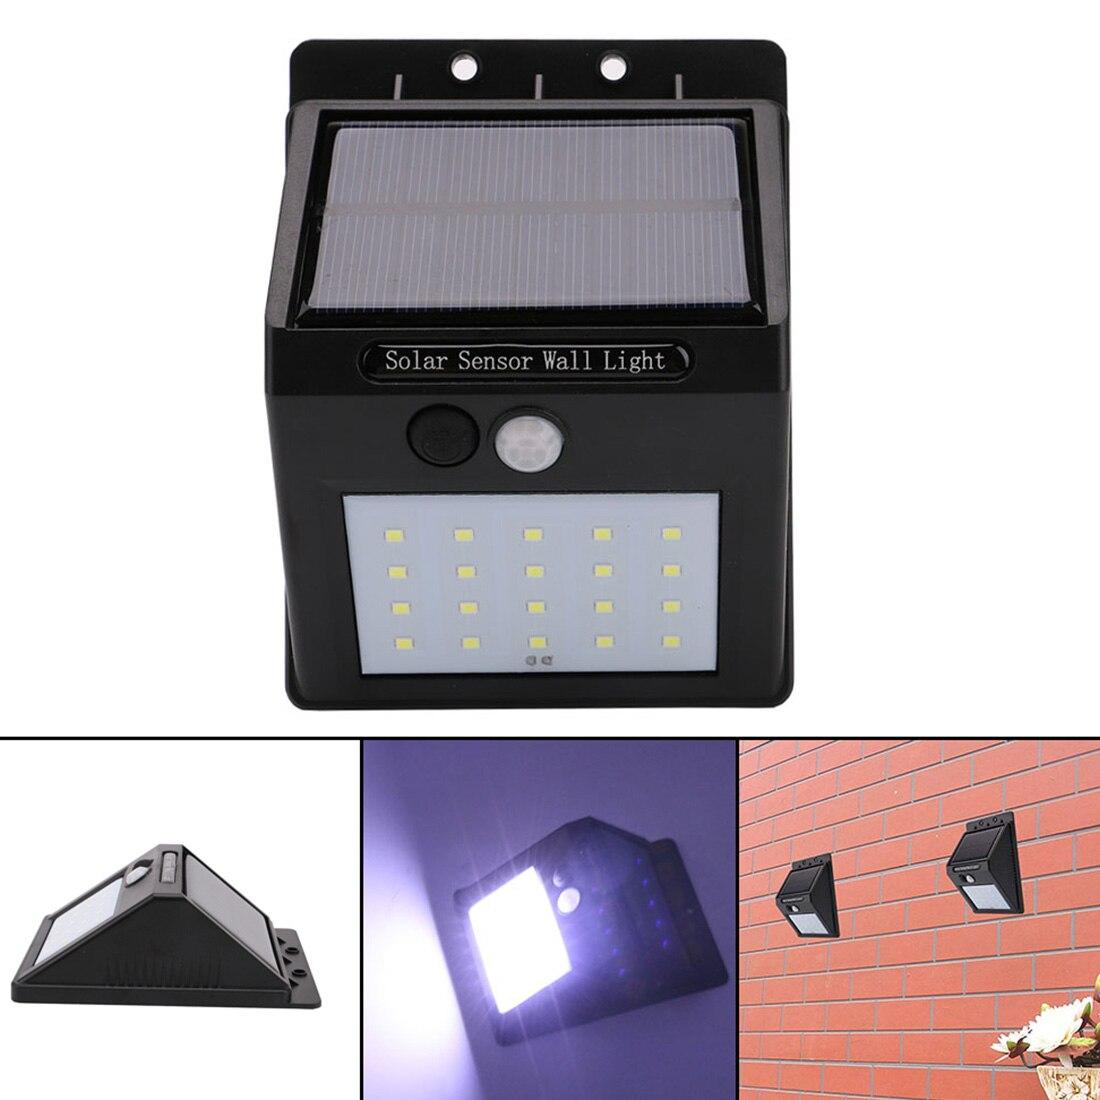 1 unid luz Solar Power Night seguridad 4-20 lámpara Solar LED PIR Sensor de movimiento lámpara de pared Sensor noche impermeable jardín Luz